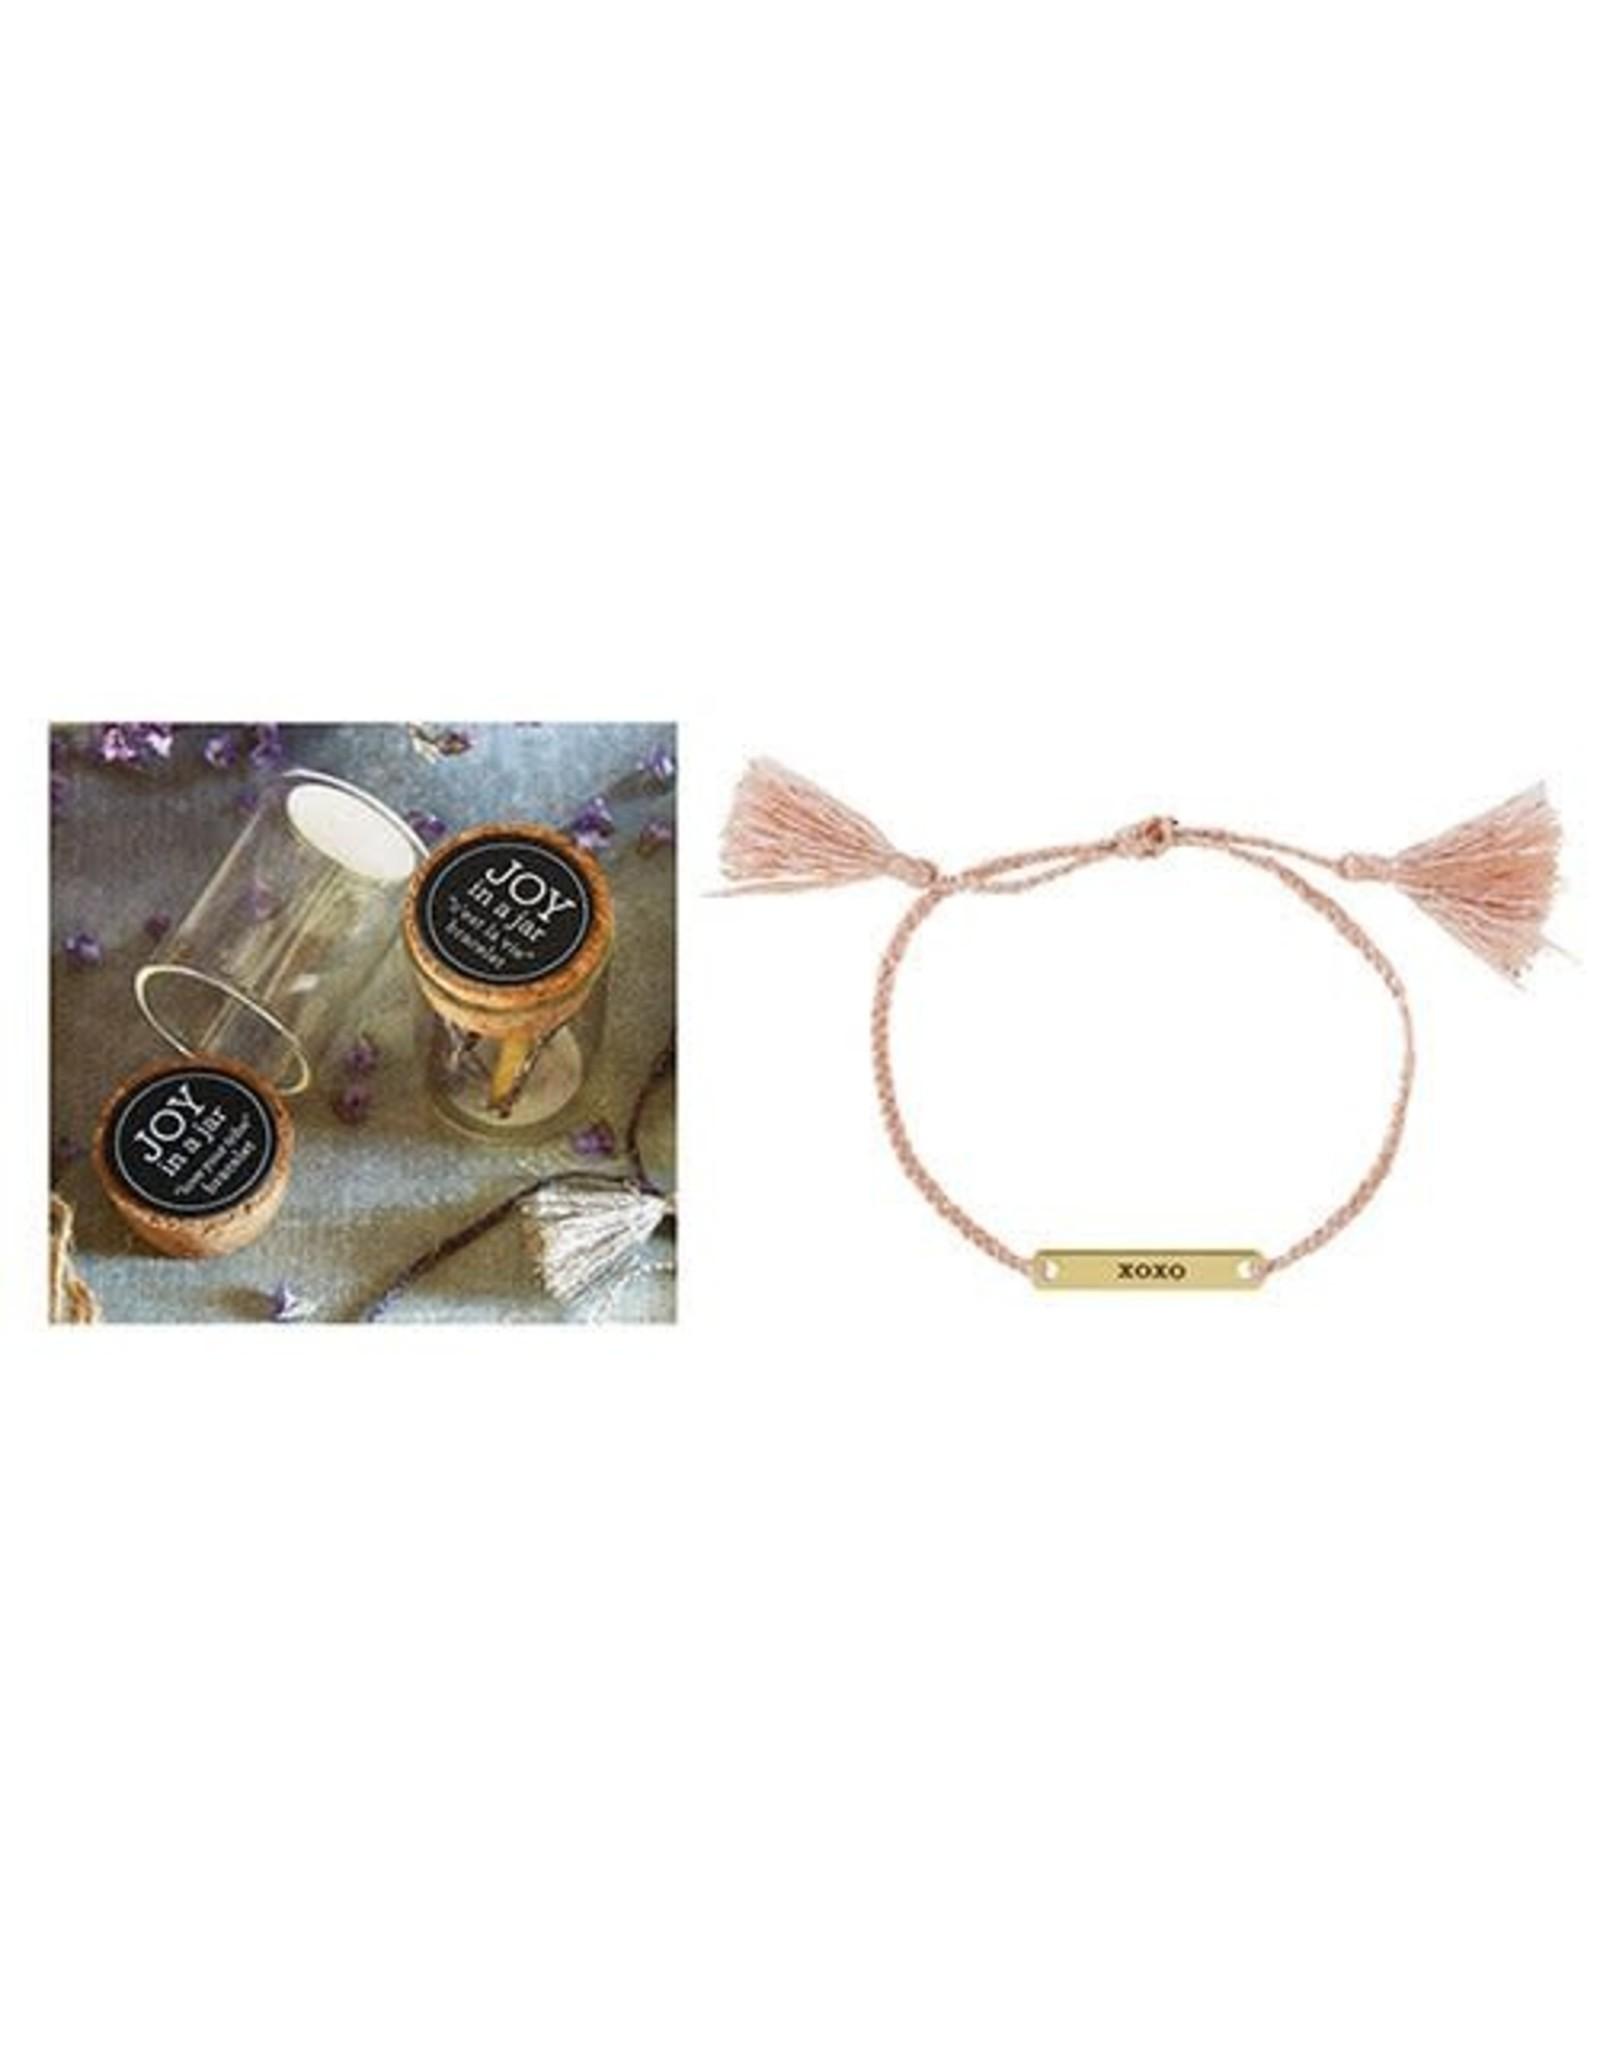 Joy in a Jar Bracelet, XOXO, blush